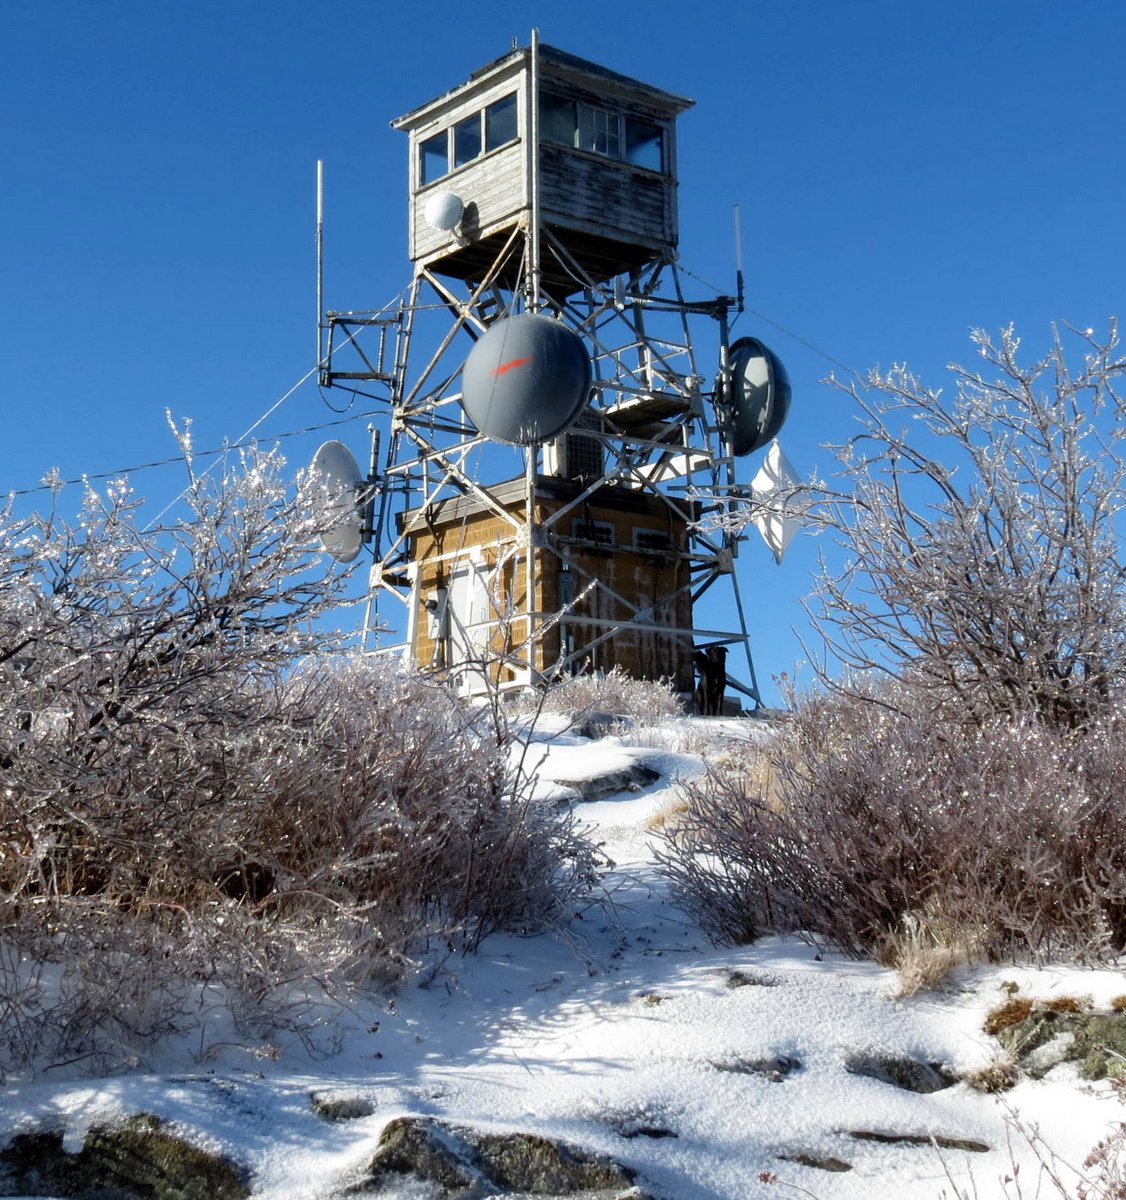 10. Fire Tower